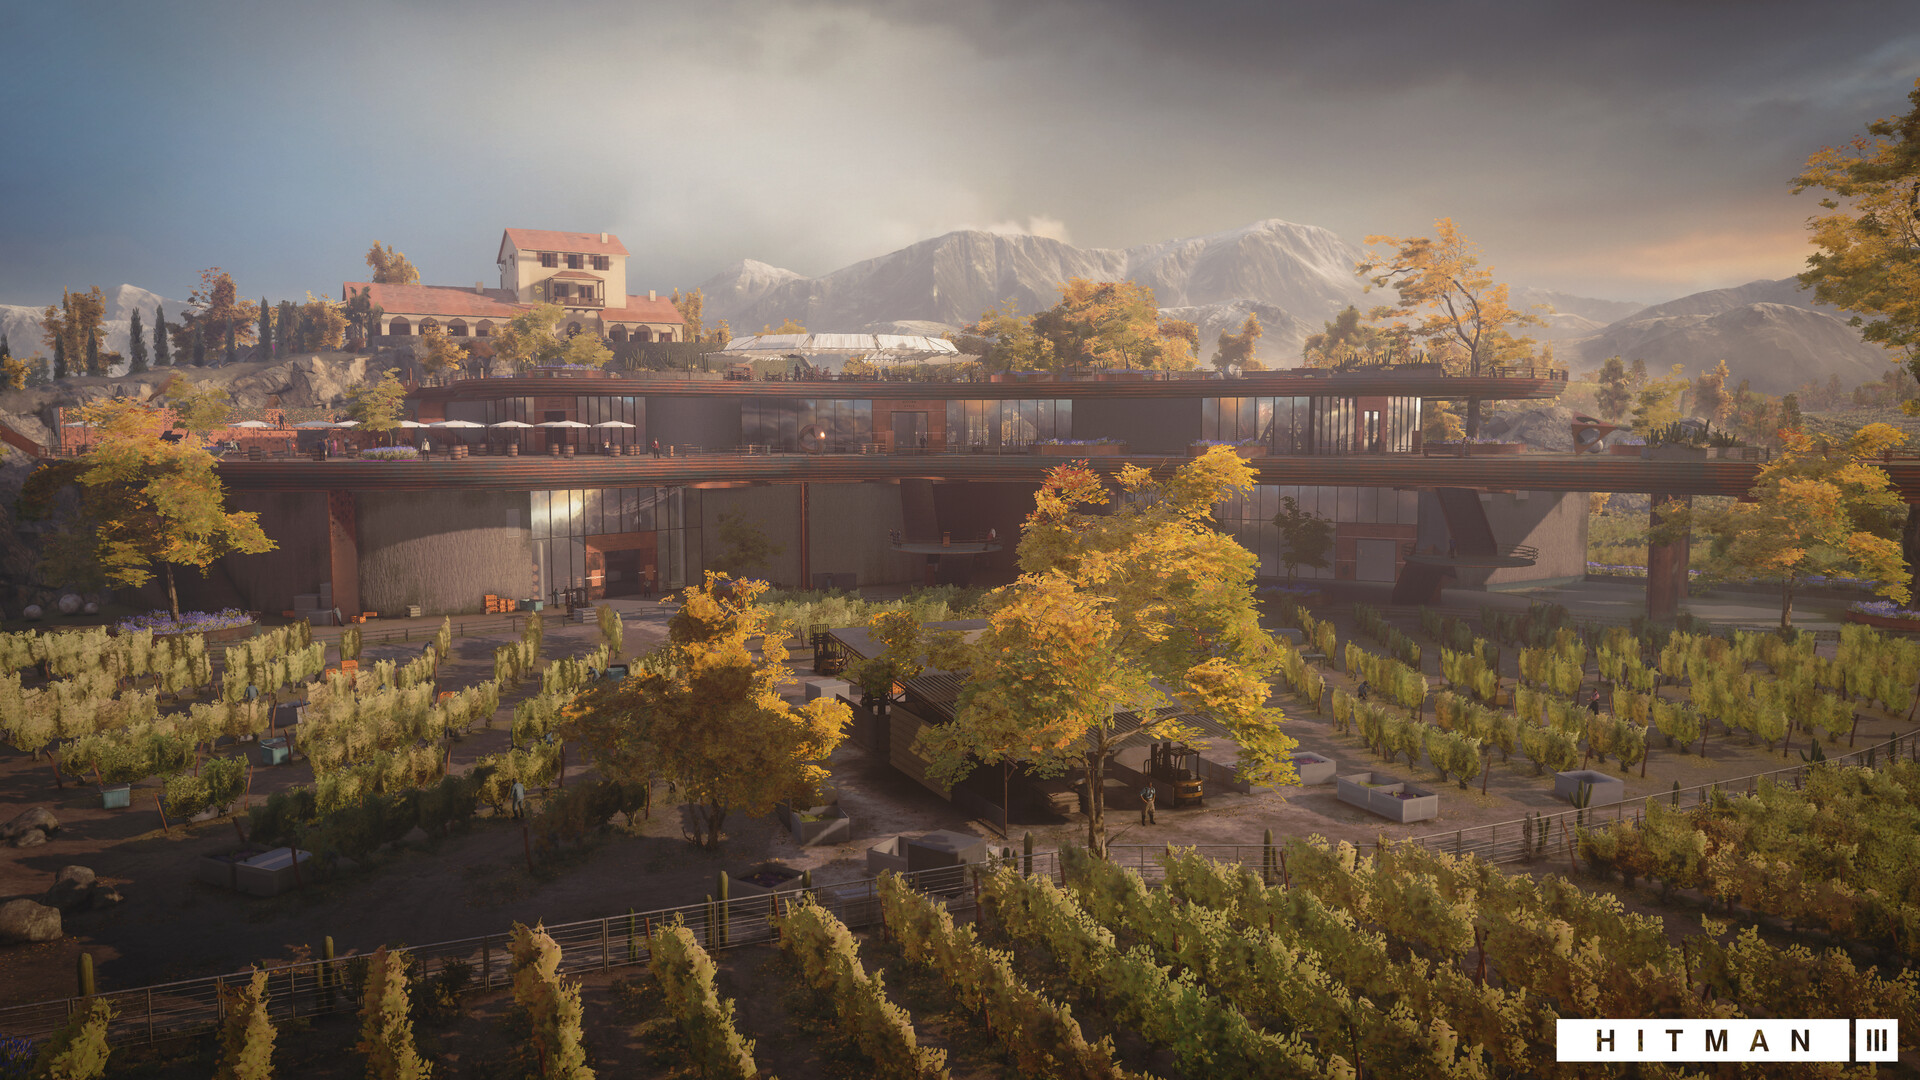 Quelle: ArtStation - Hitman 3: Mendoza (2021) - Weingut